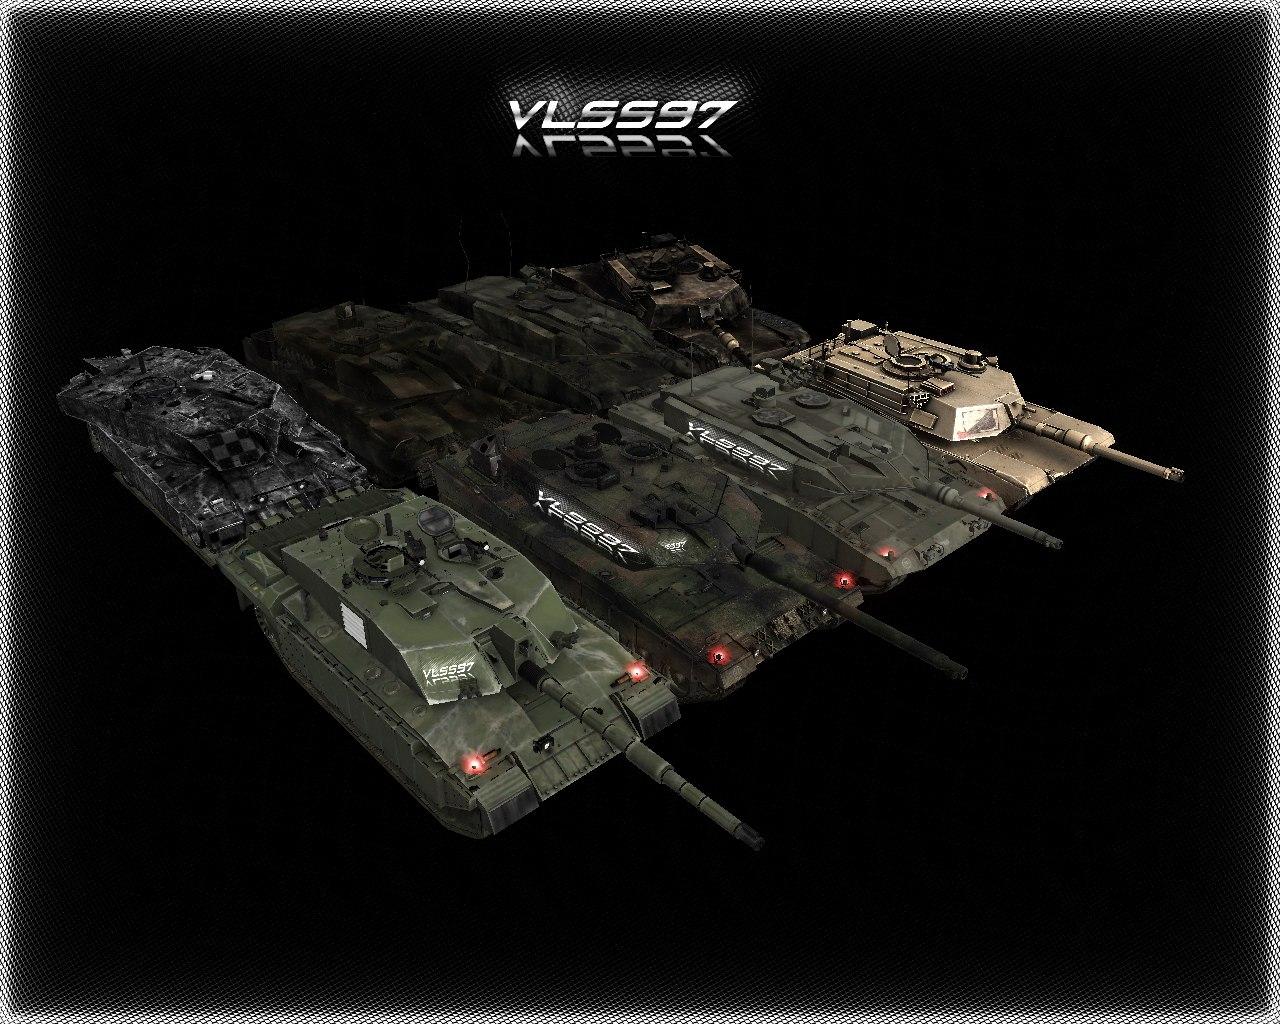 Скачать Challenger2, Leopard2a6, Leopard2a7, M1A2 — бесплатно